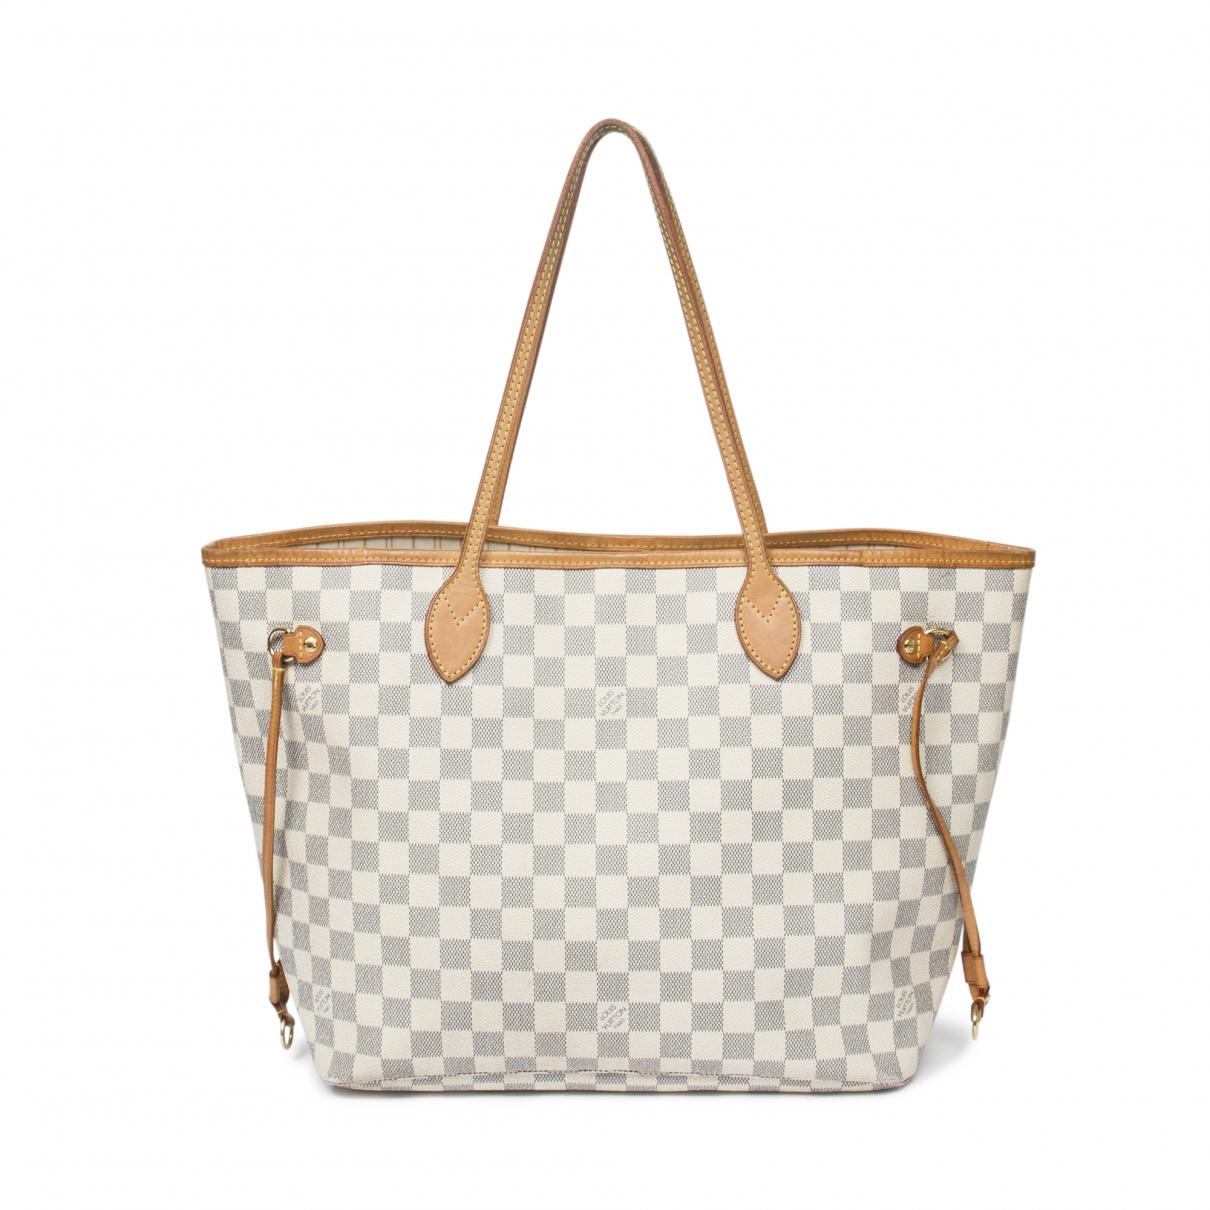 Louis Vuitton Neverfull Handtasche in  Beige Leder